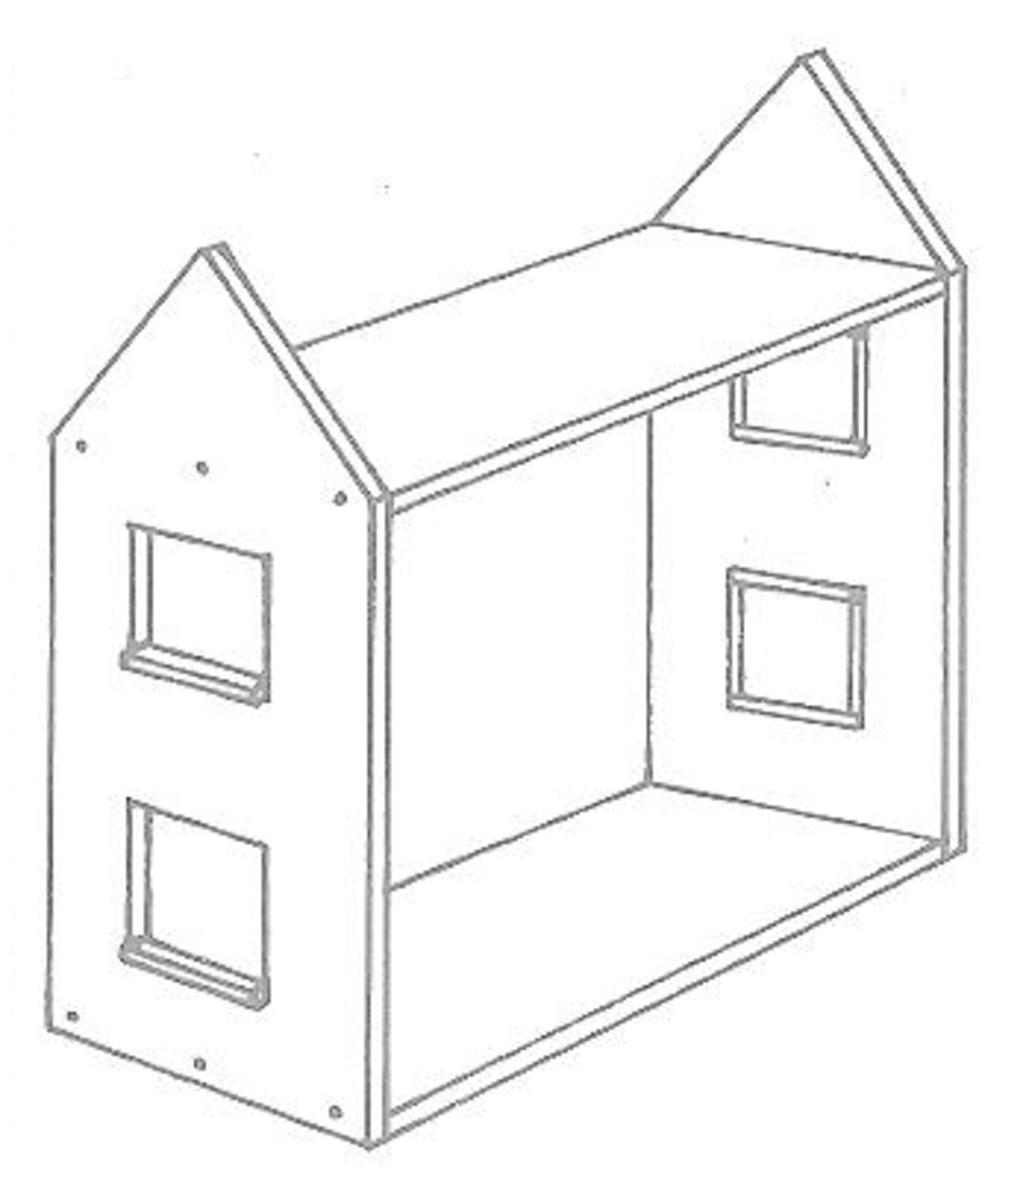 Figure 3 - Dollhouse Main Frame